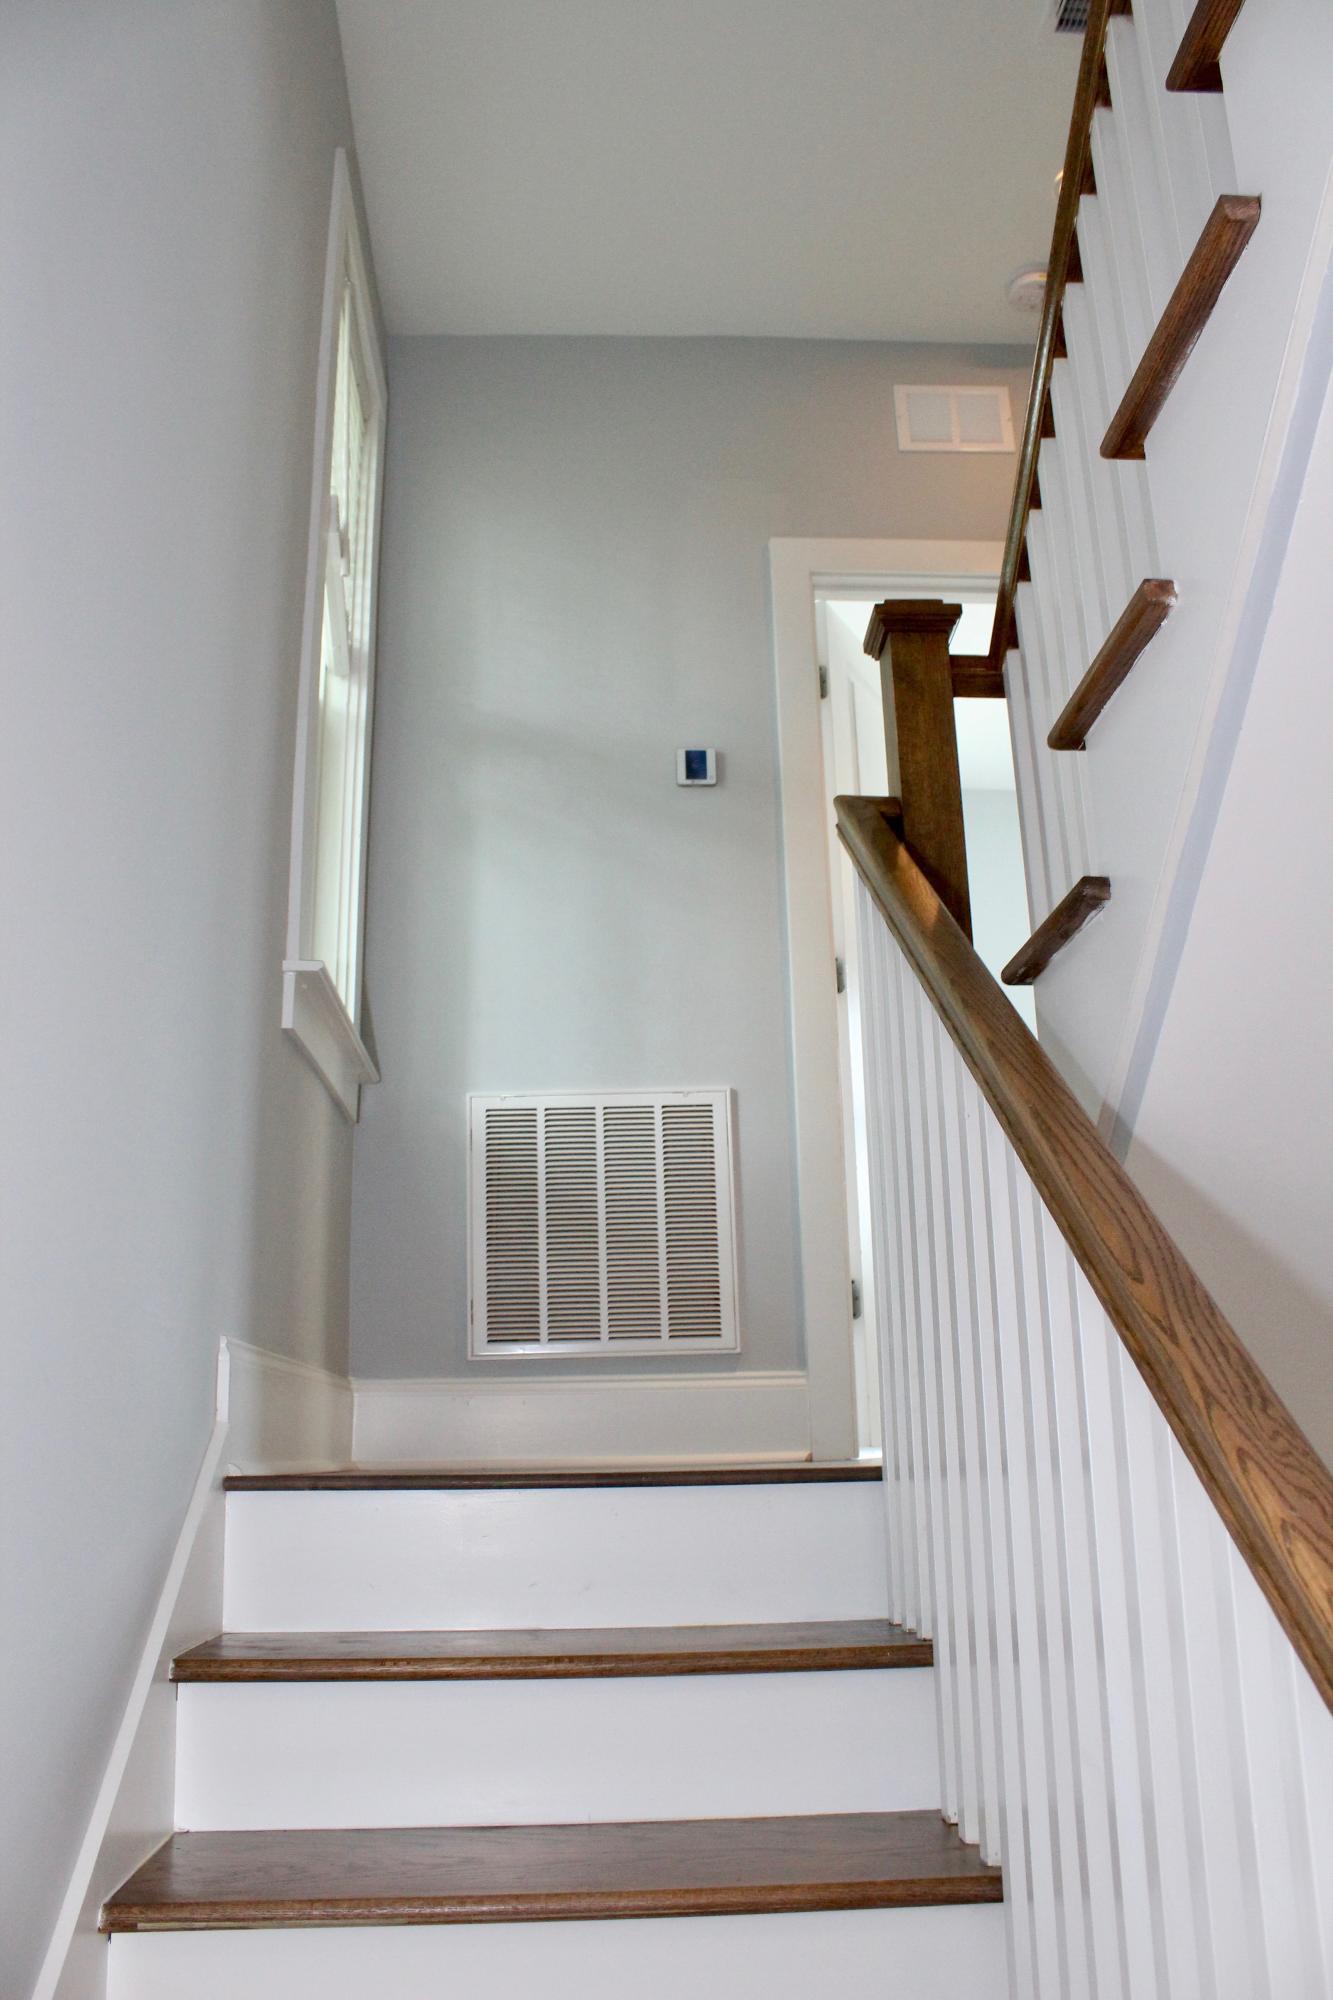 Morris Square Homes For Sale - 41 Dereef, Charleston, SC - 30